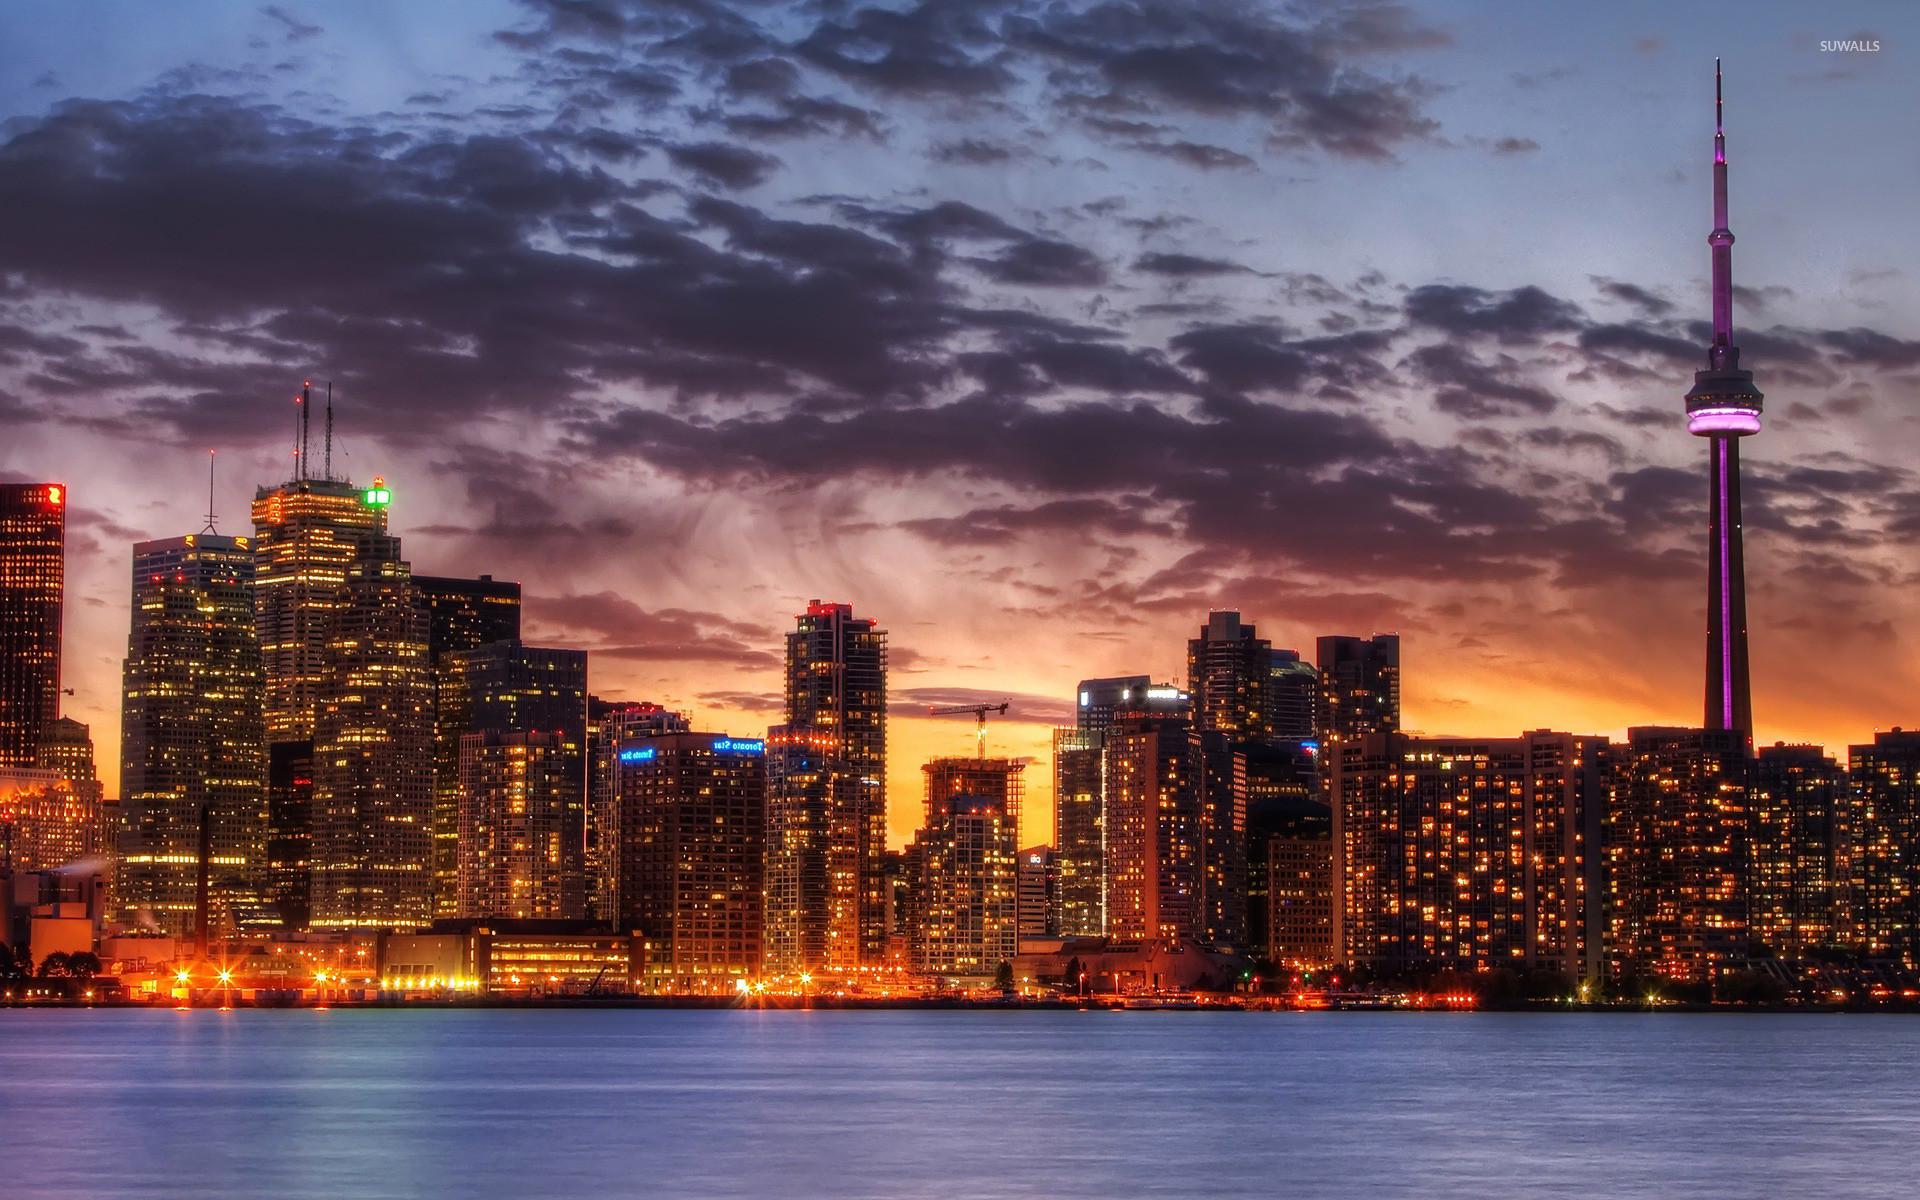 Toronto Skyline Wallpaper 61 Images